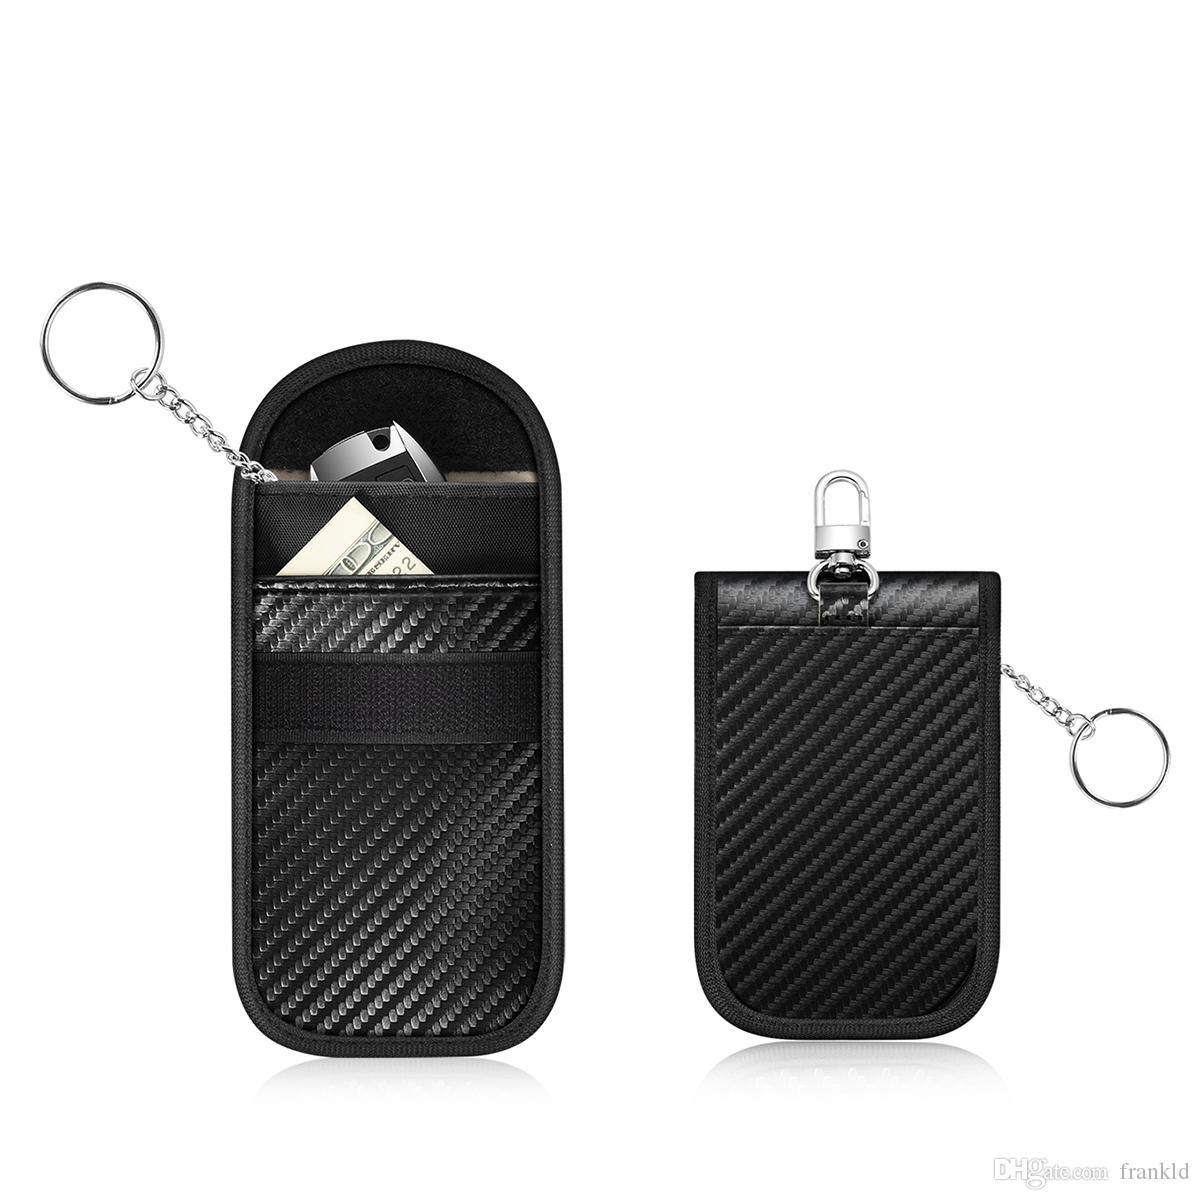 RFID Signal Blocking Bag Signal Shielding Pouch Wallet Case for Car Key Fob UK